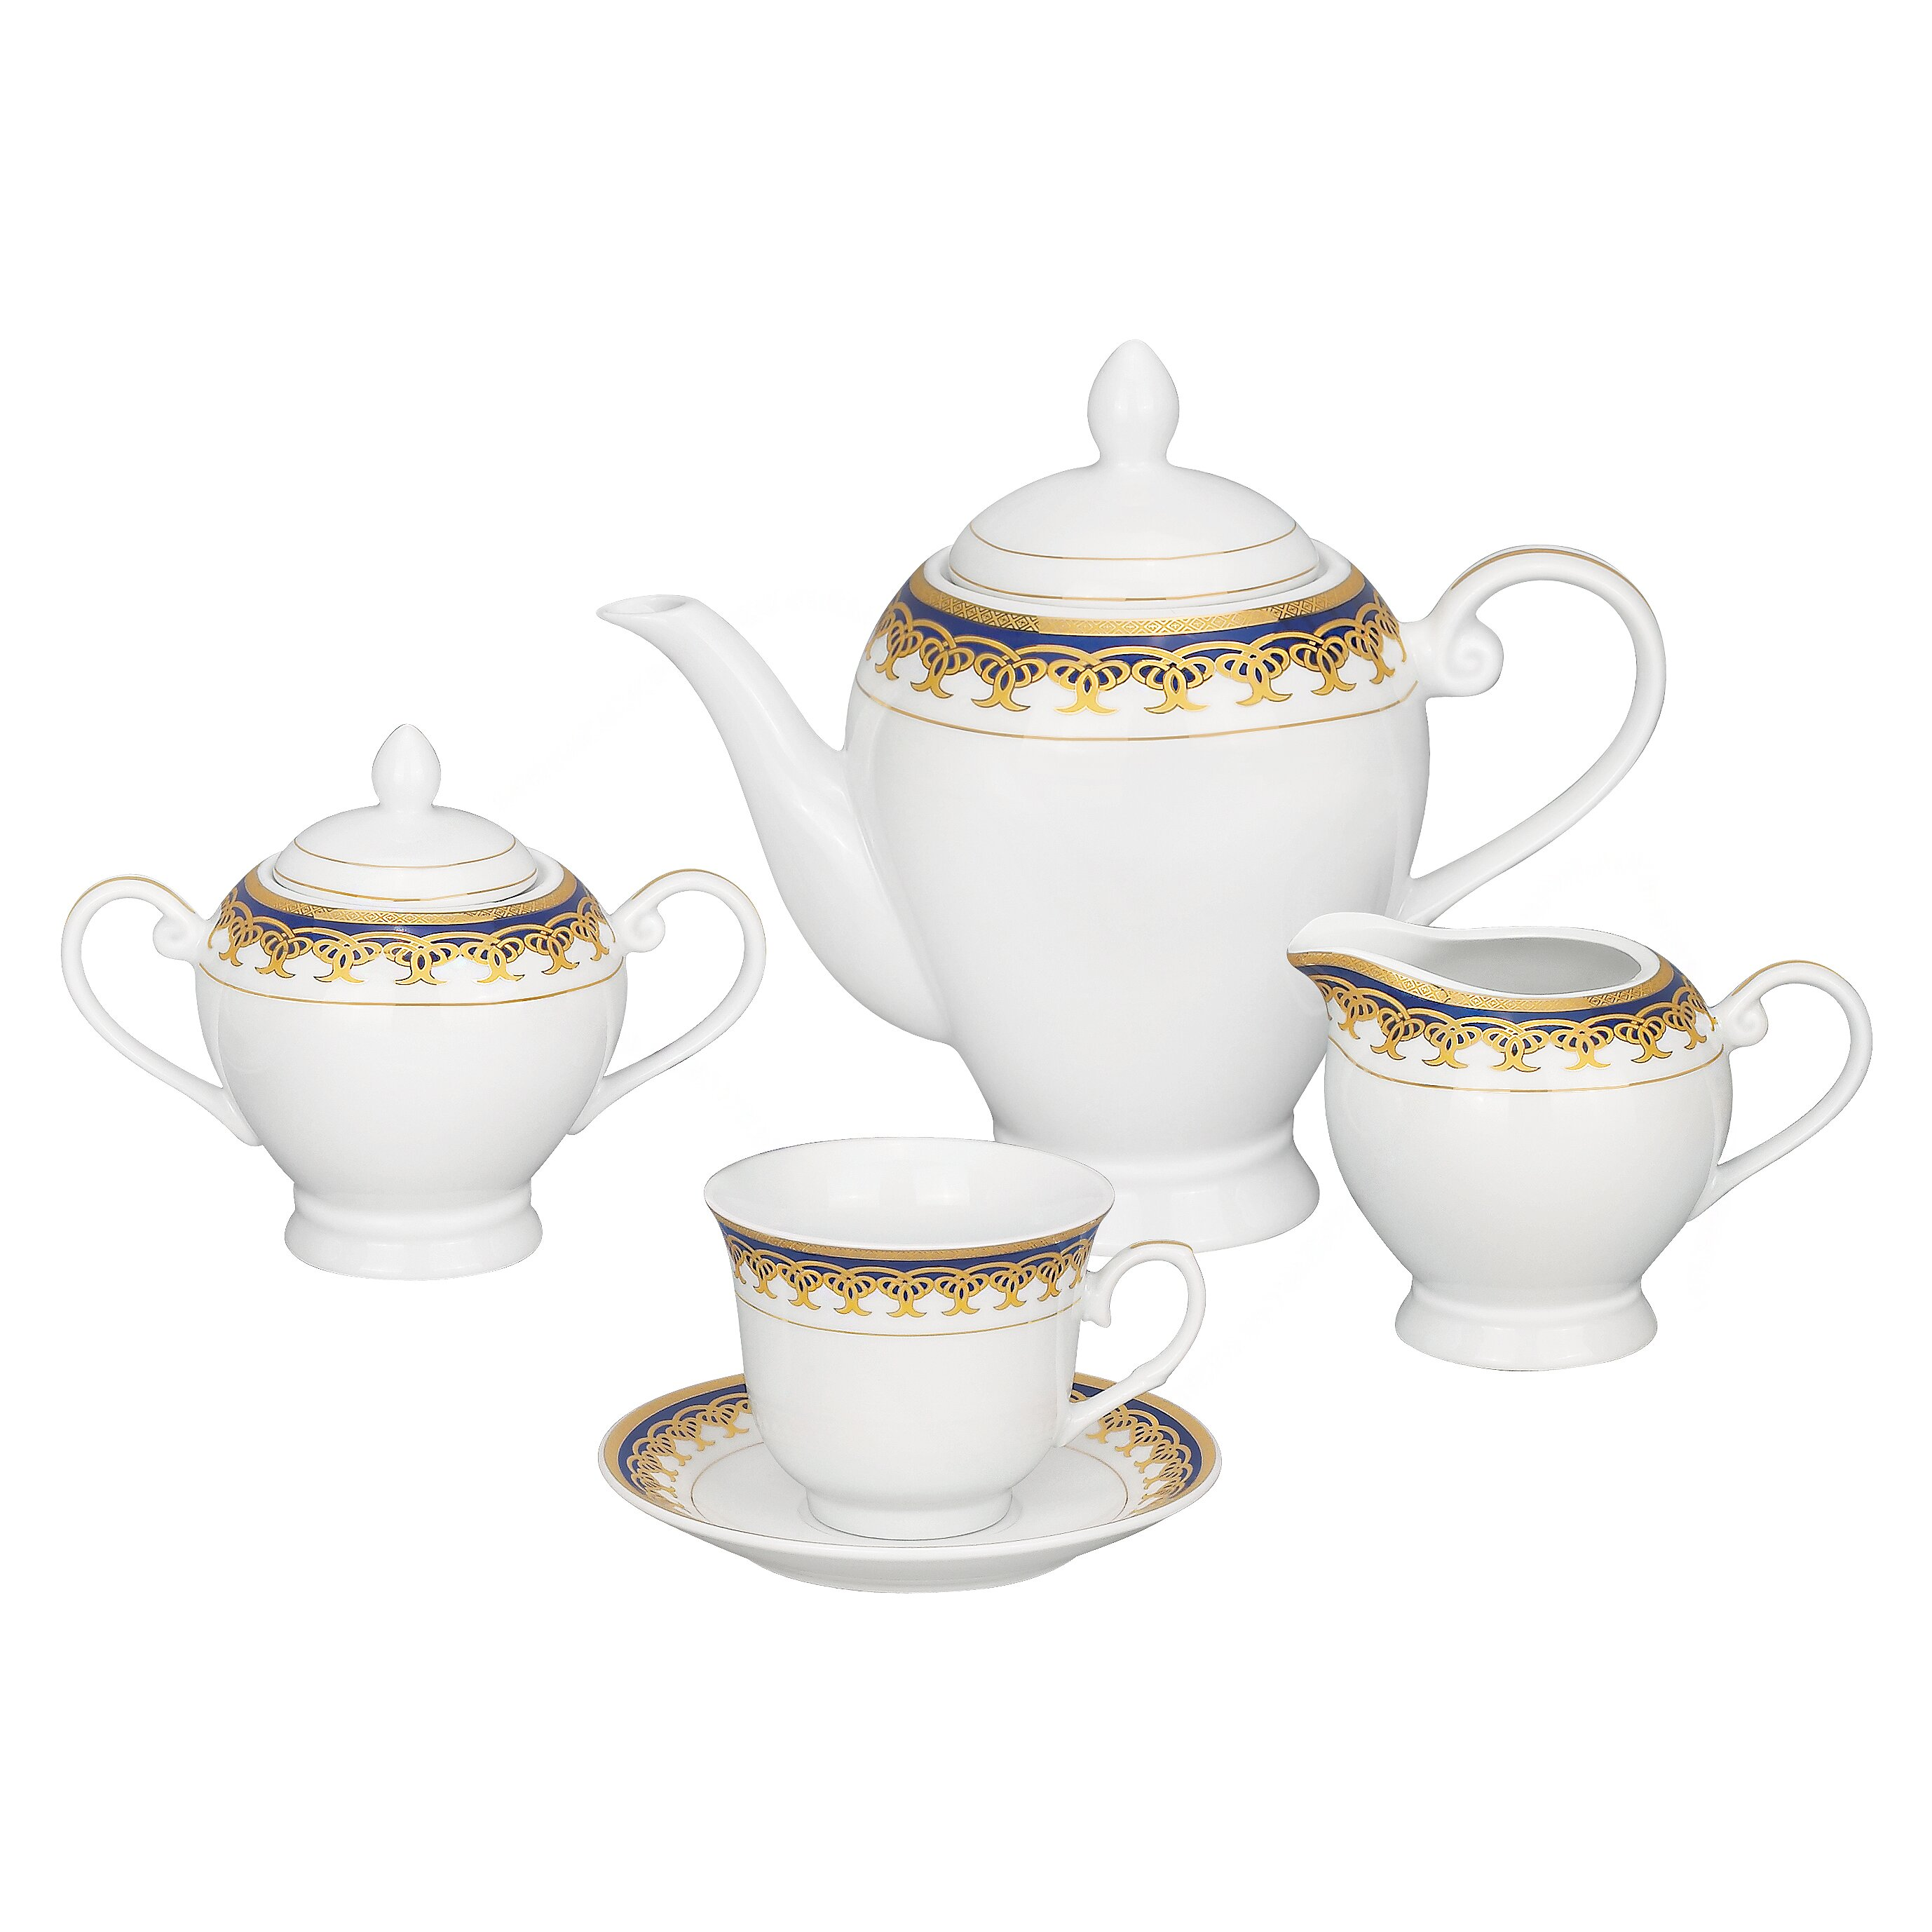 Lorren home trends iris 57 piece porcelain dinnerware set for Kitchen dish sets